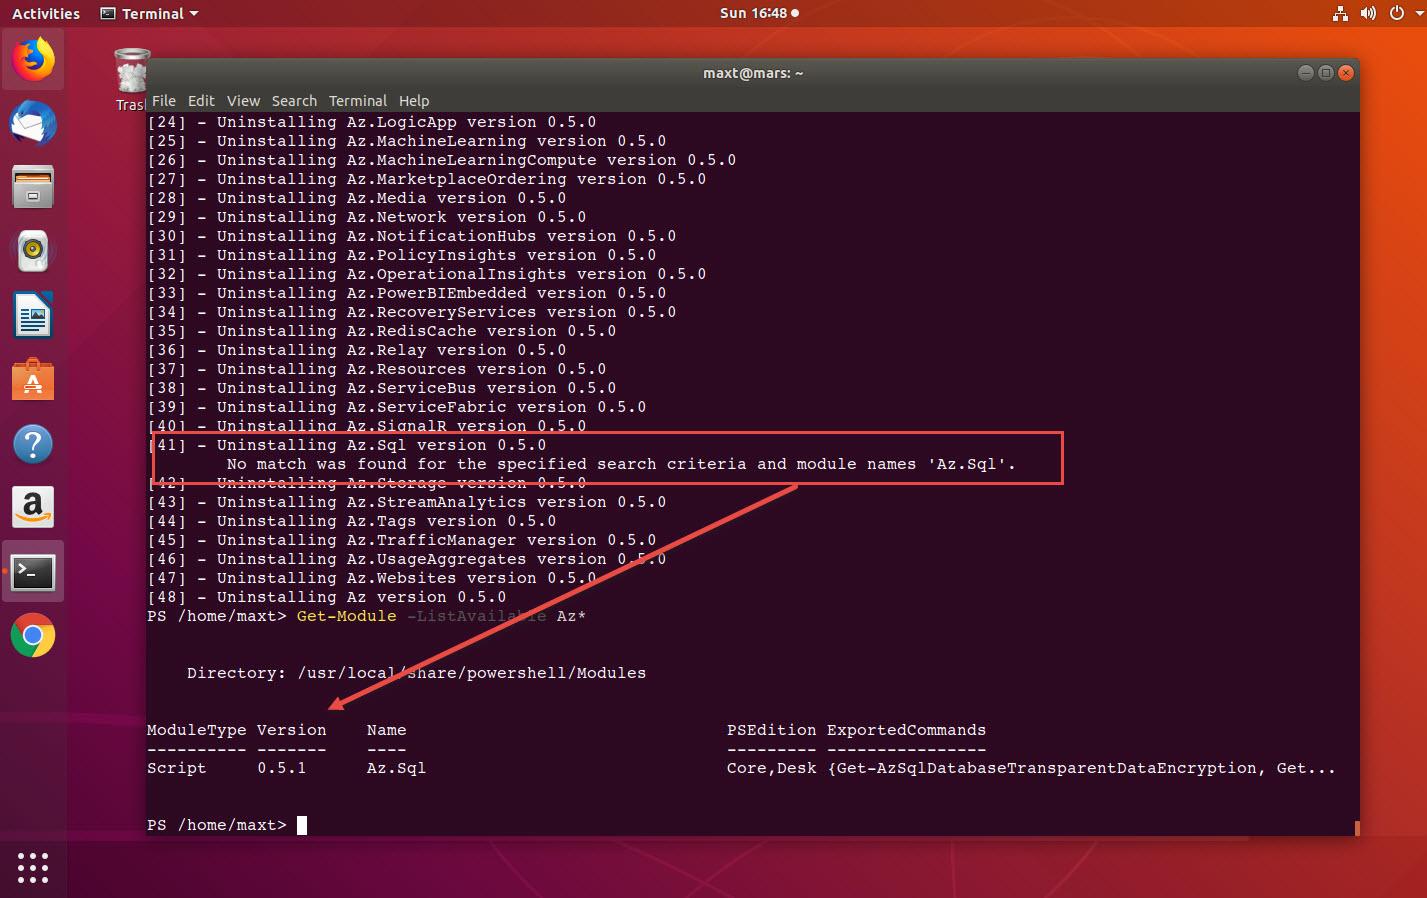 Uninstall-AllModules - won't uninstall all dependencies due